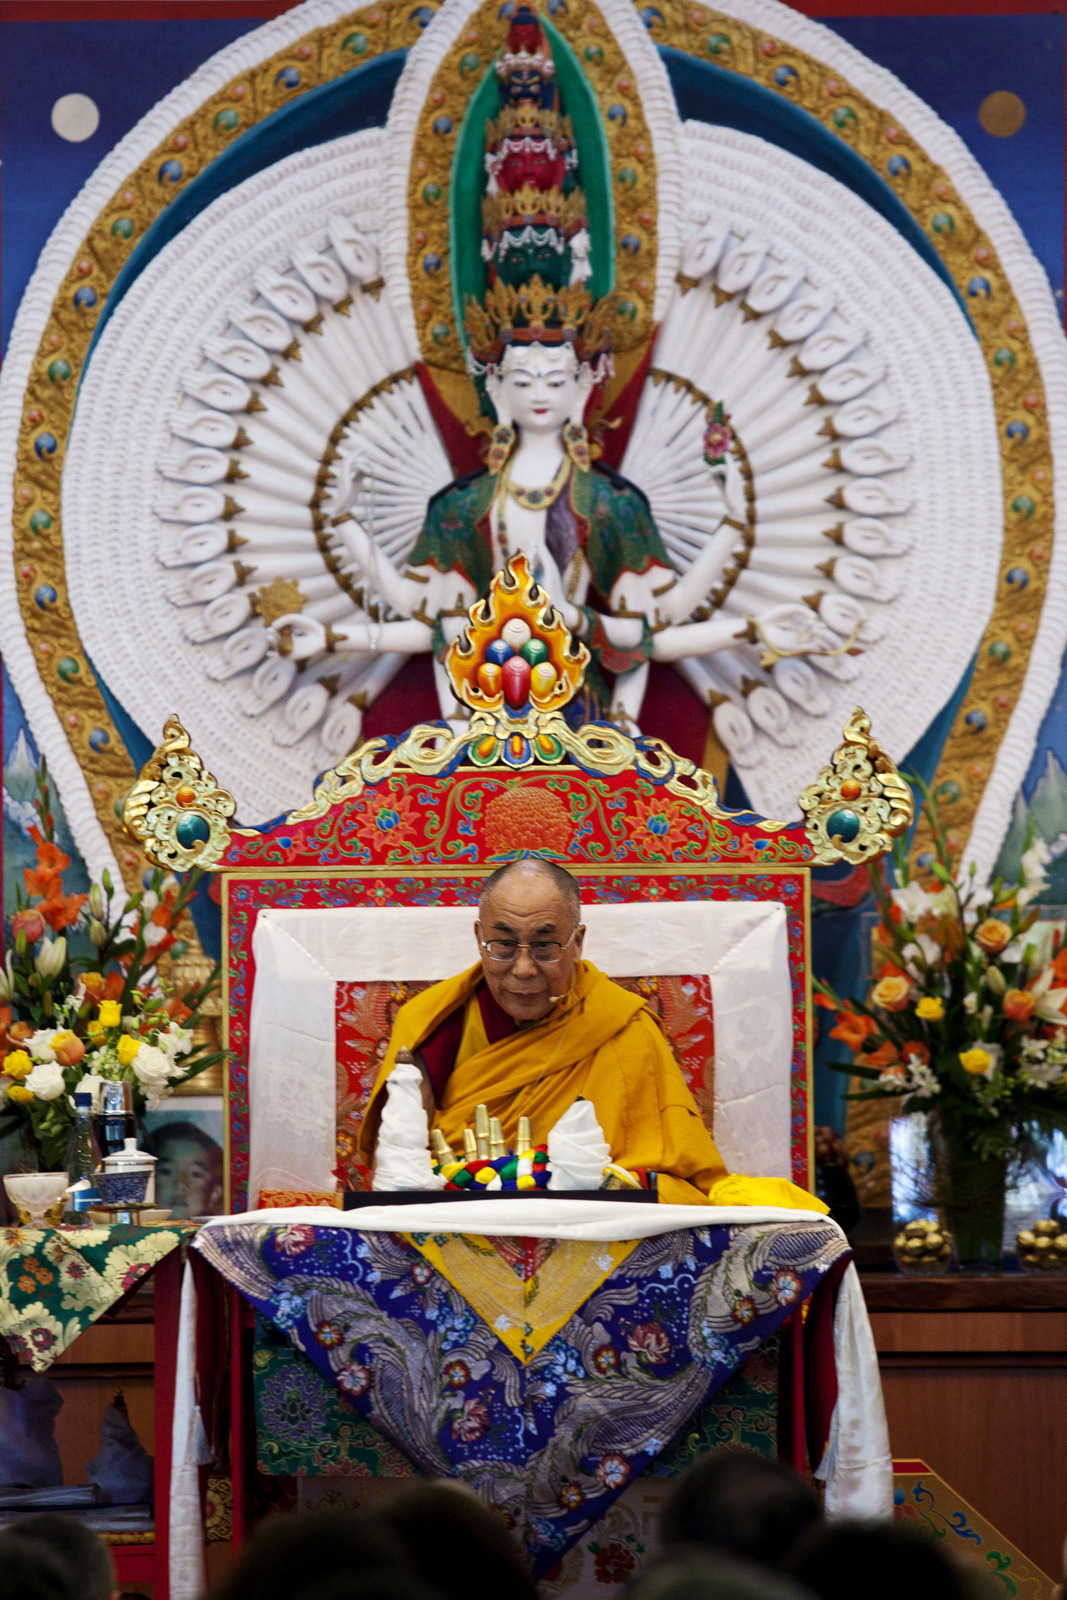 His Holiness the Dalai Lama at Chenrezig Institute, Australia, 2014. (Photo Bonnie Jenkins)